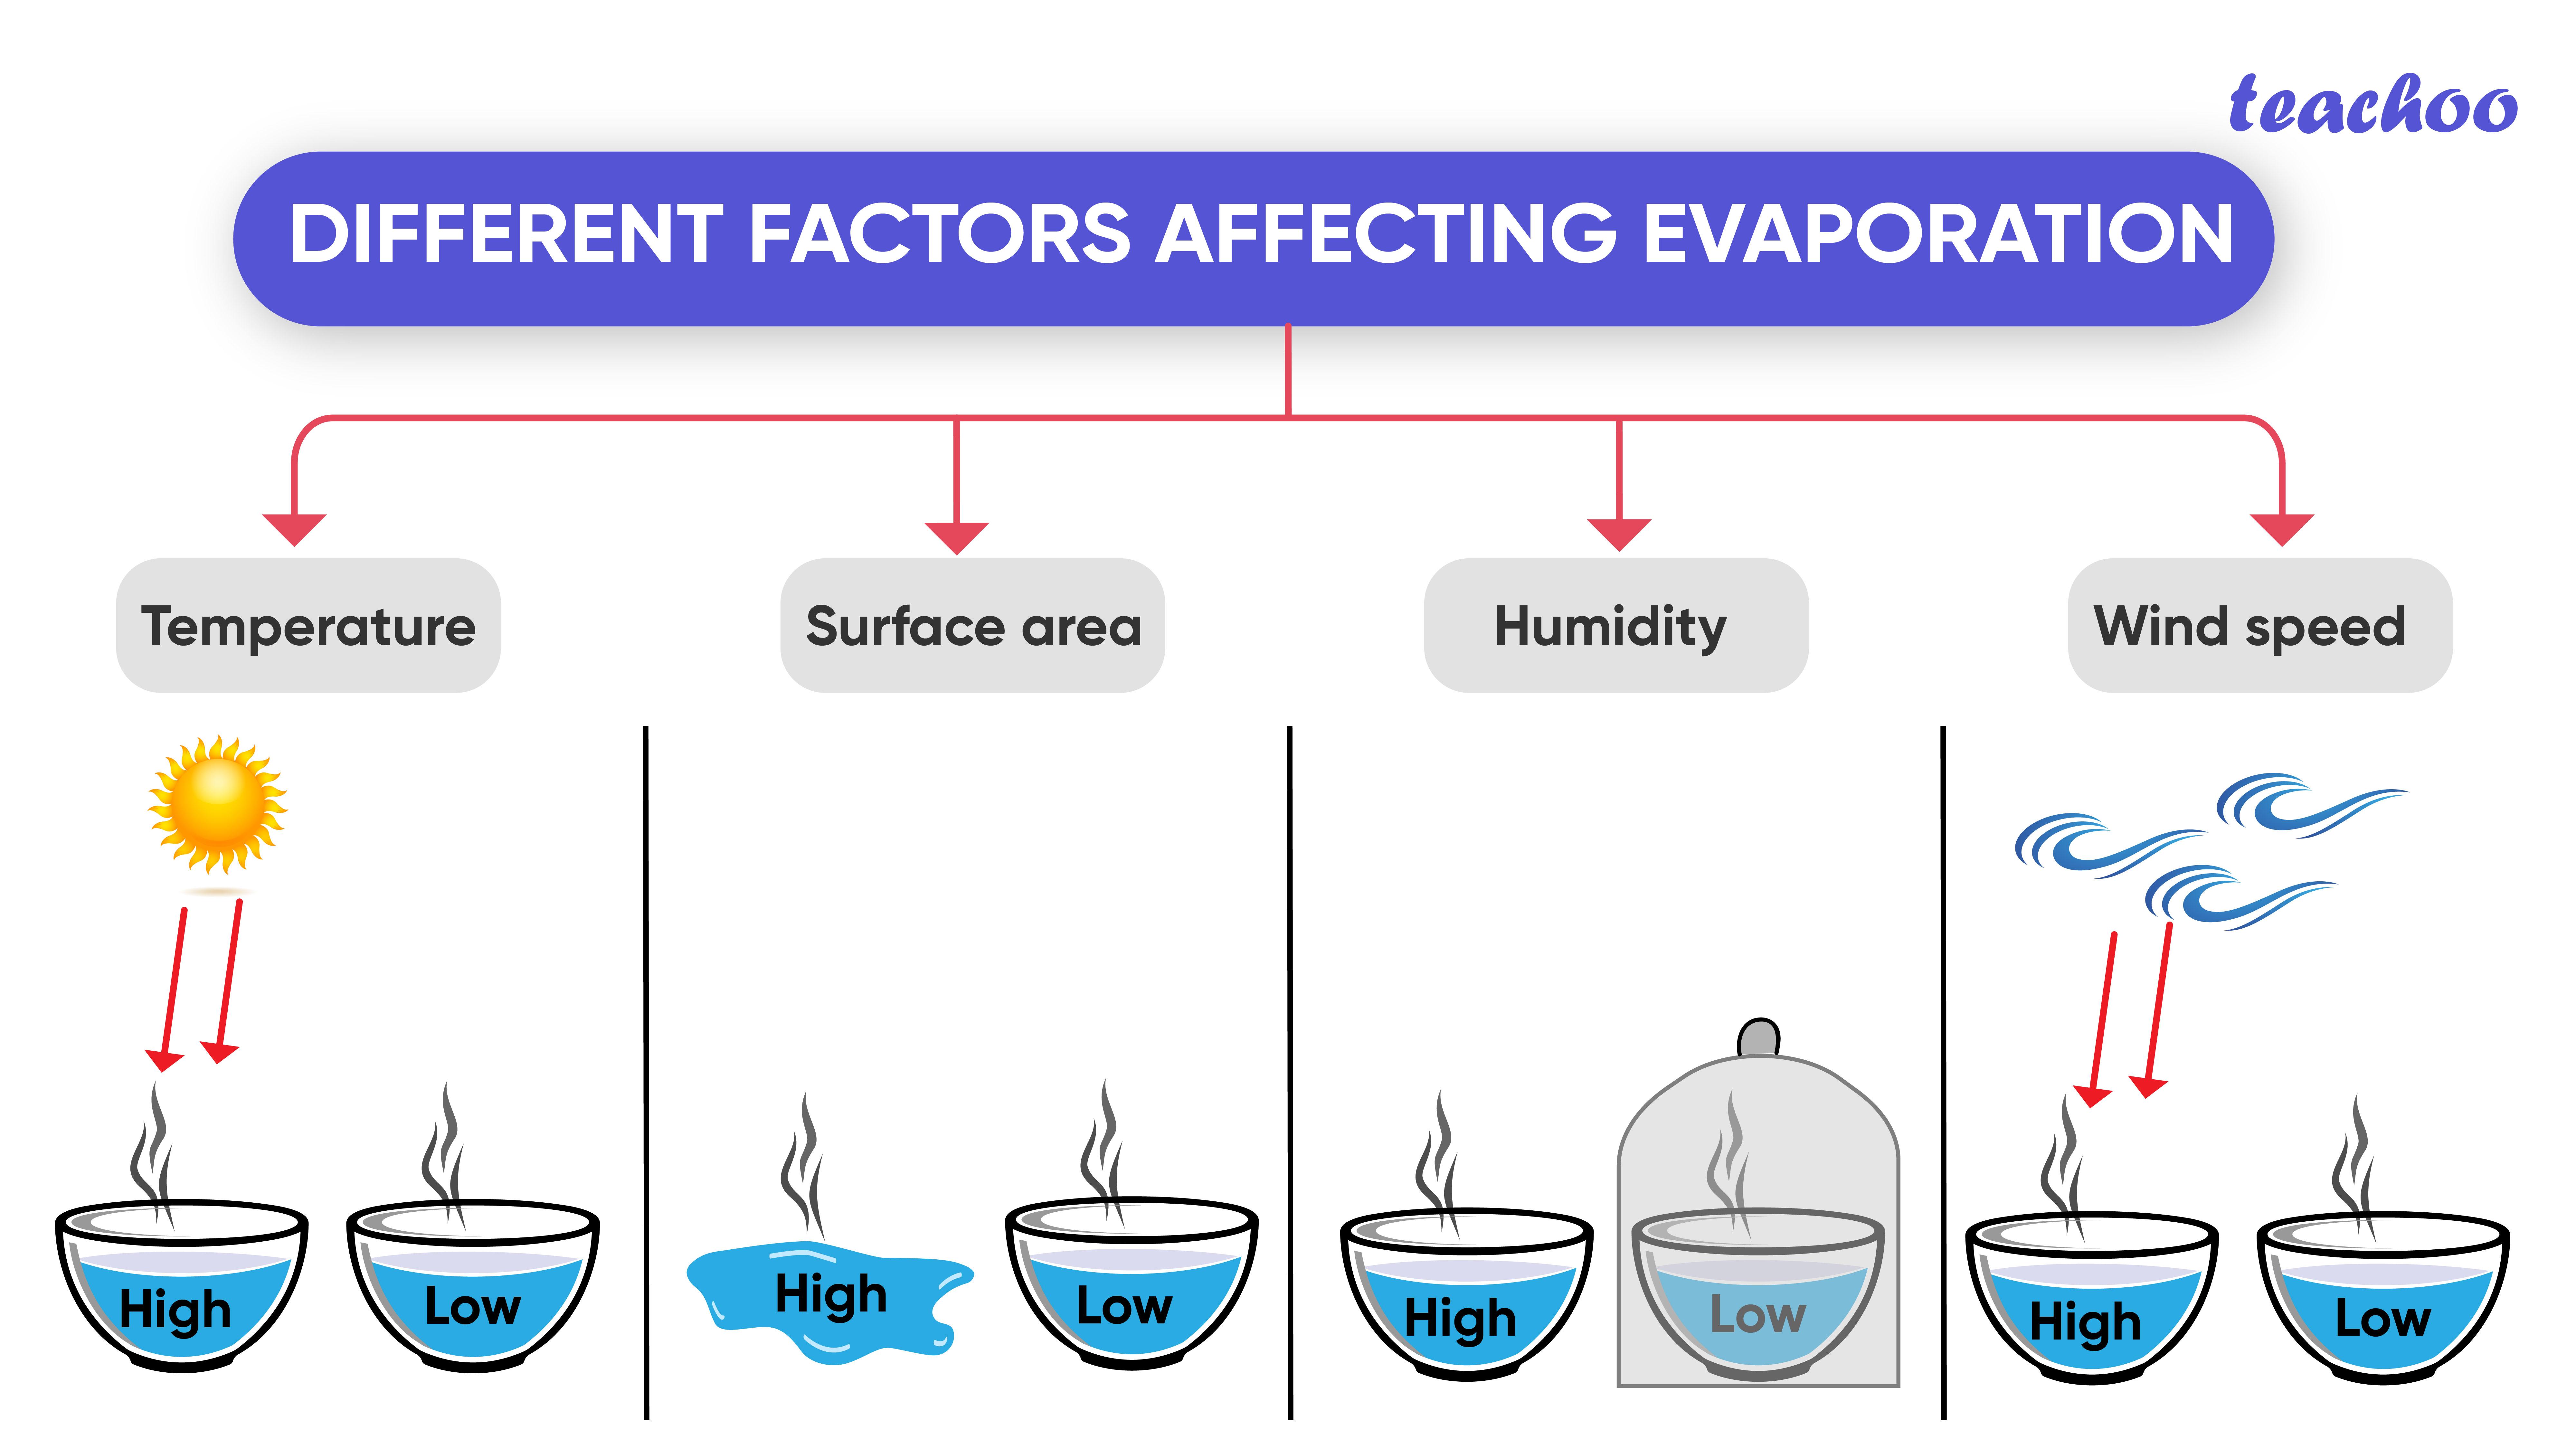 Different factors affecting evaporation-Teachoo-01.jpg